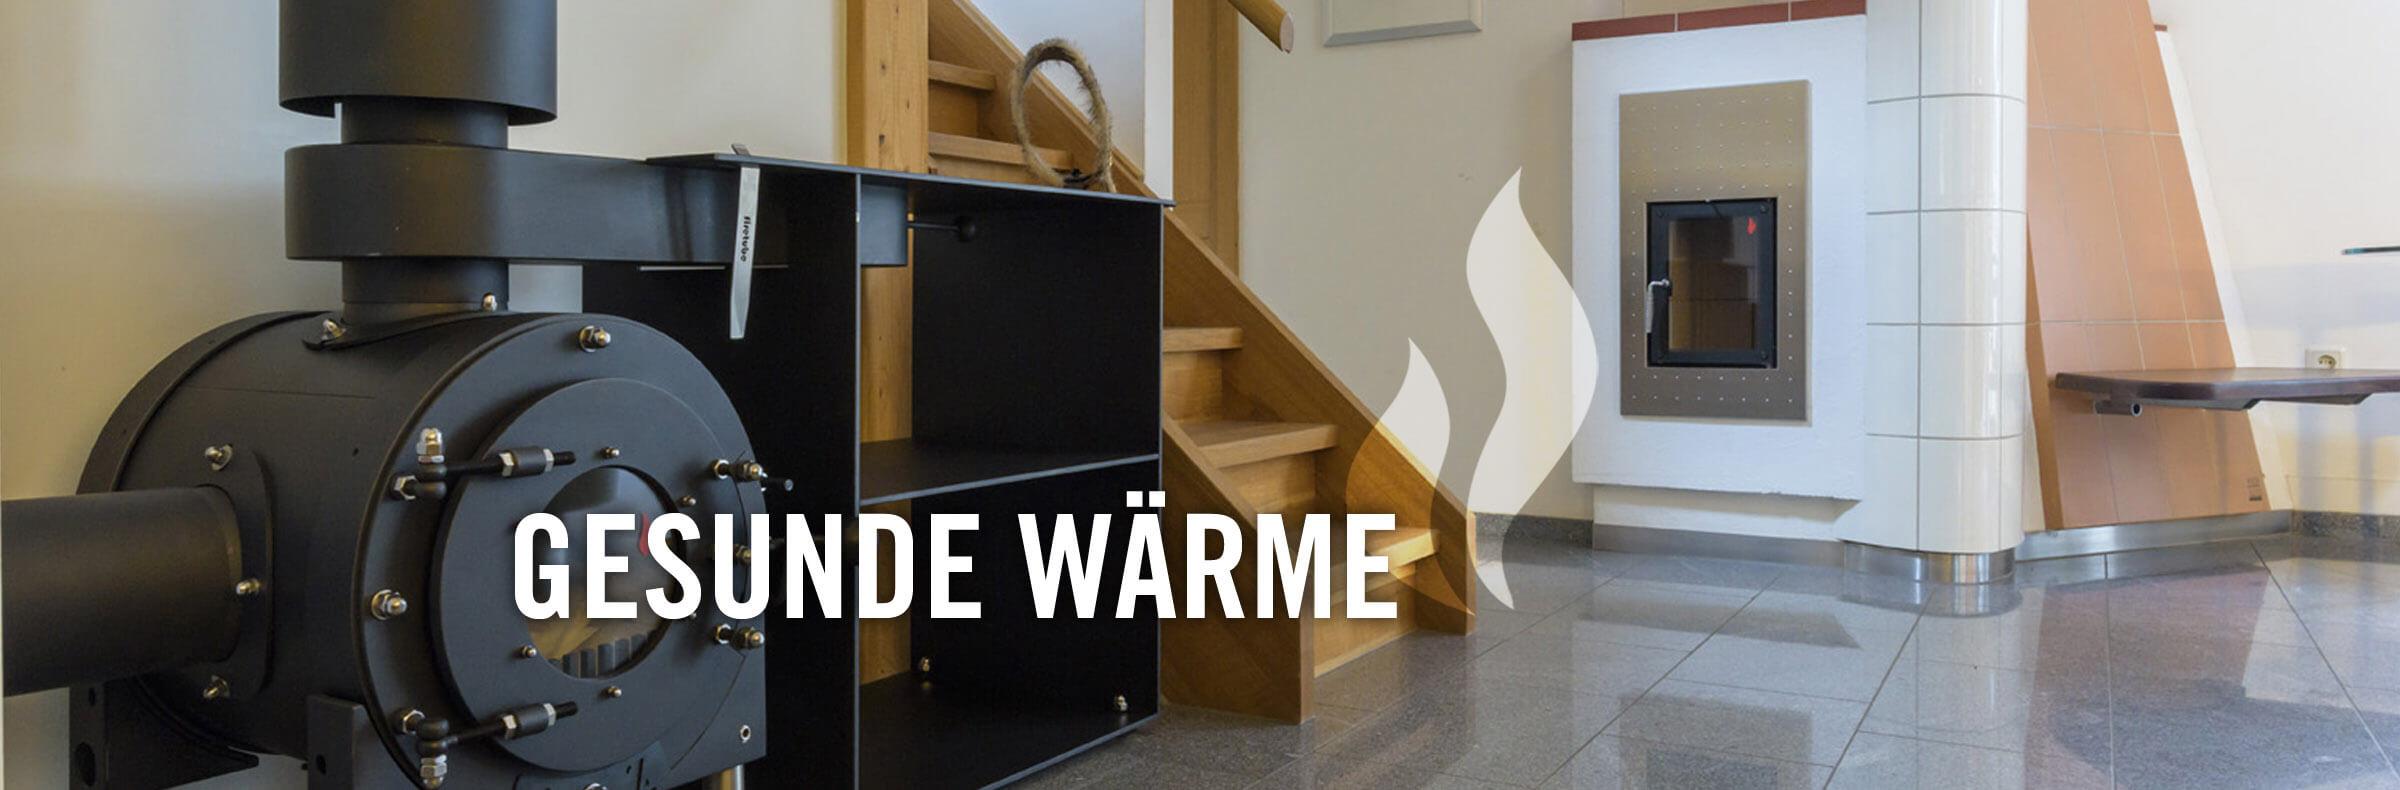 Firetube, Hörner Ausstellung